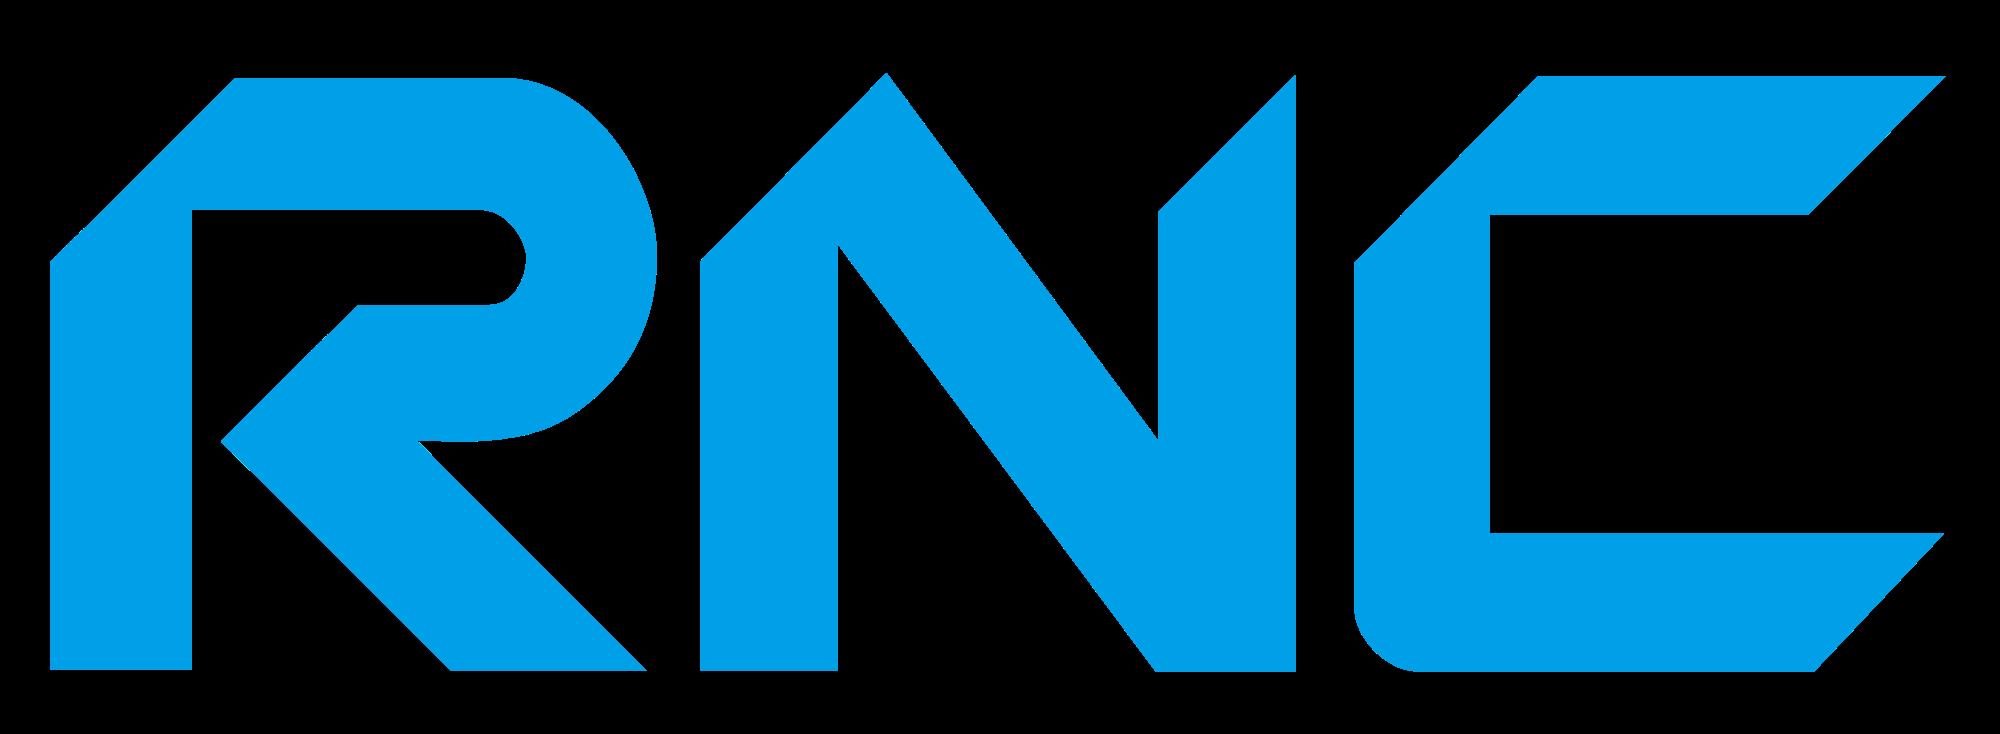 Nishitouhon Broadcasting